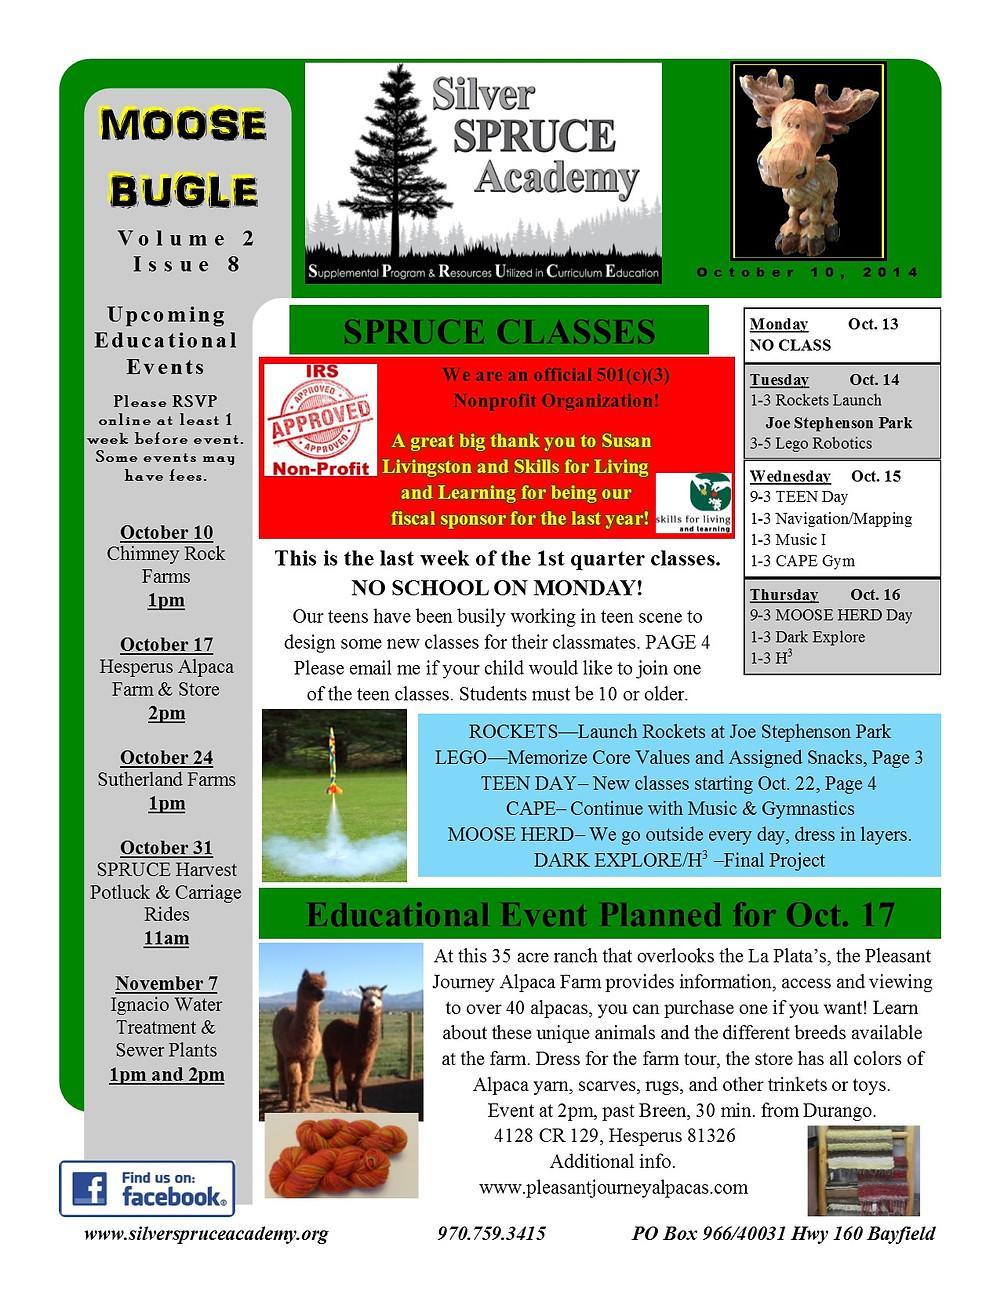 Moose Bugle 10-10-14 Page 1.jpg